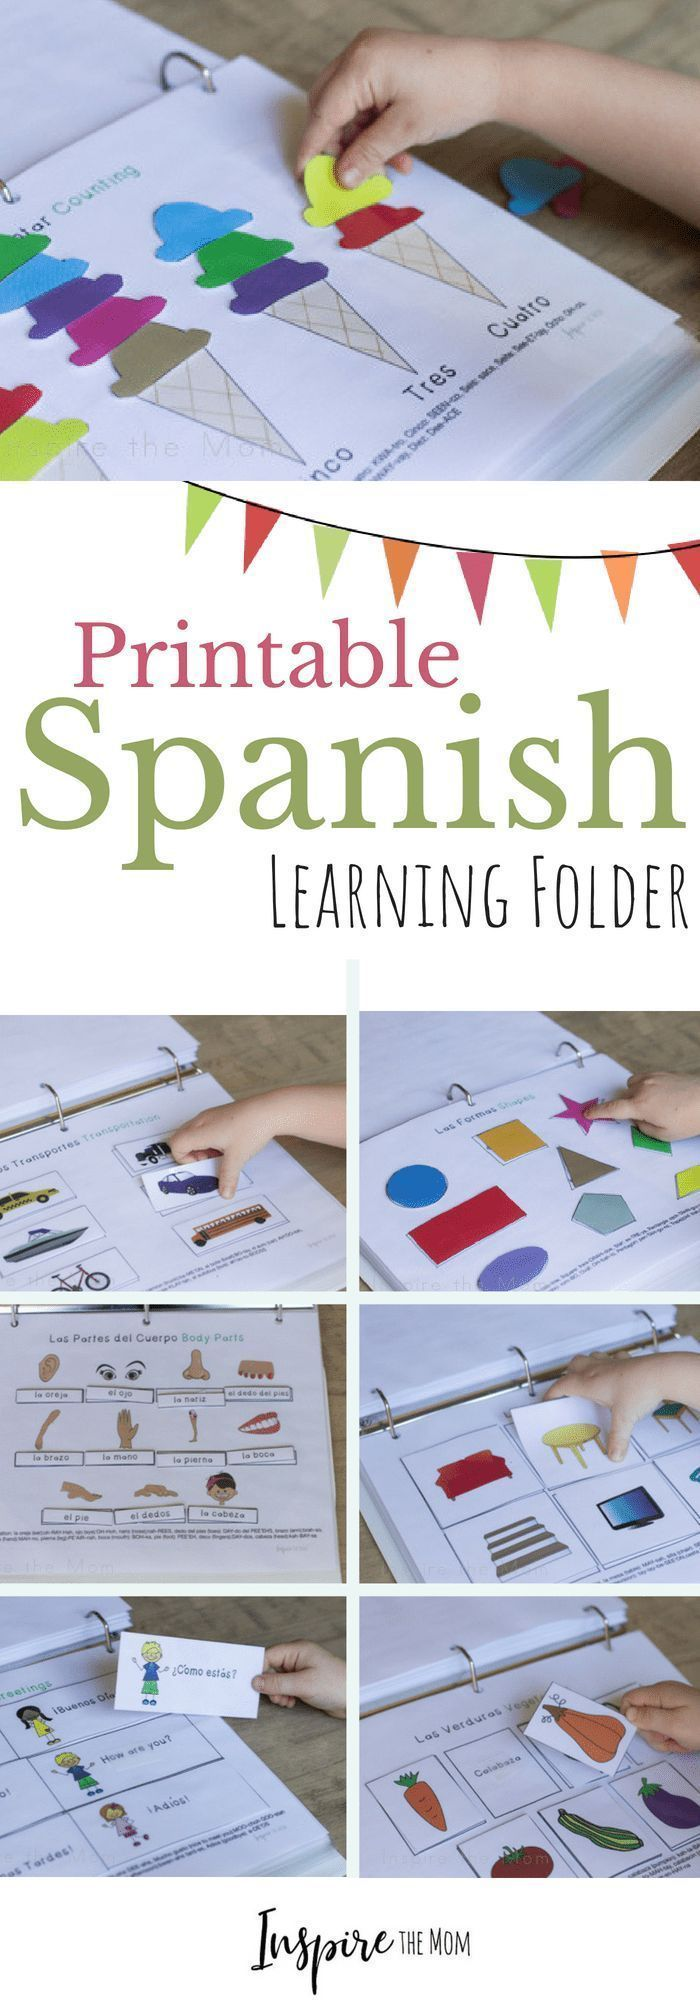 Printable Spanish Interactive Learning Folder - Inspire the Mom